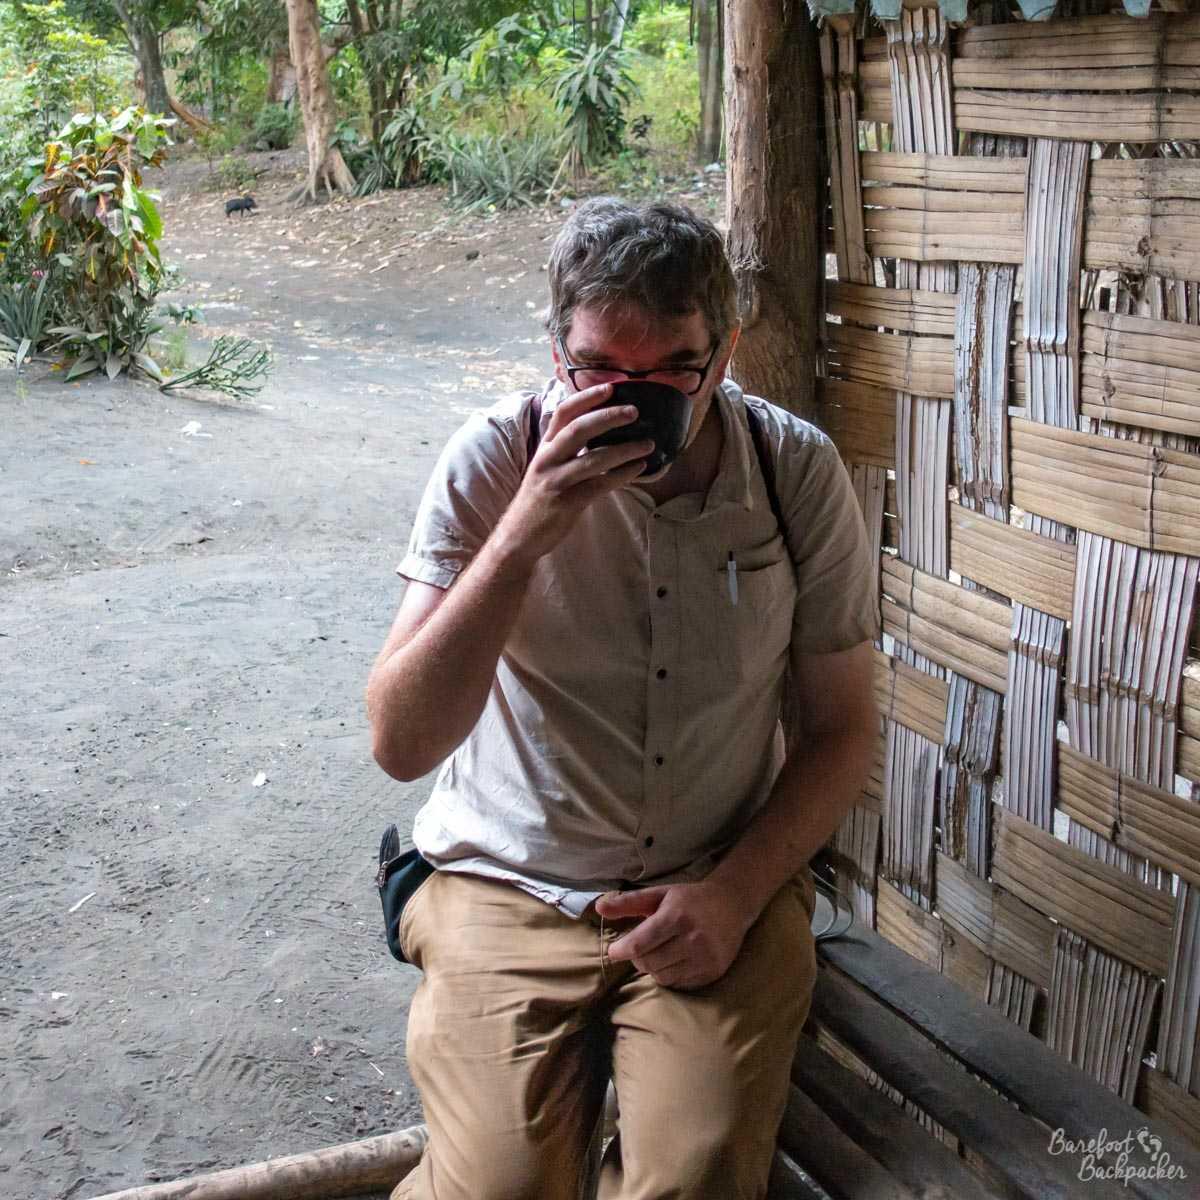 The Barefoot Backpacker drinking kava.